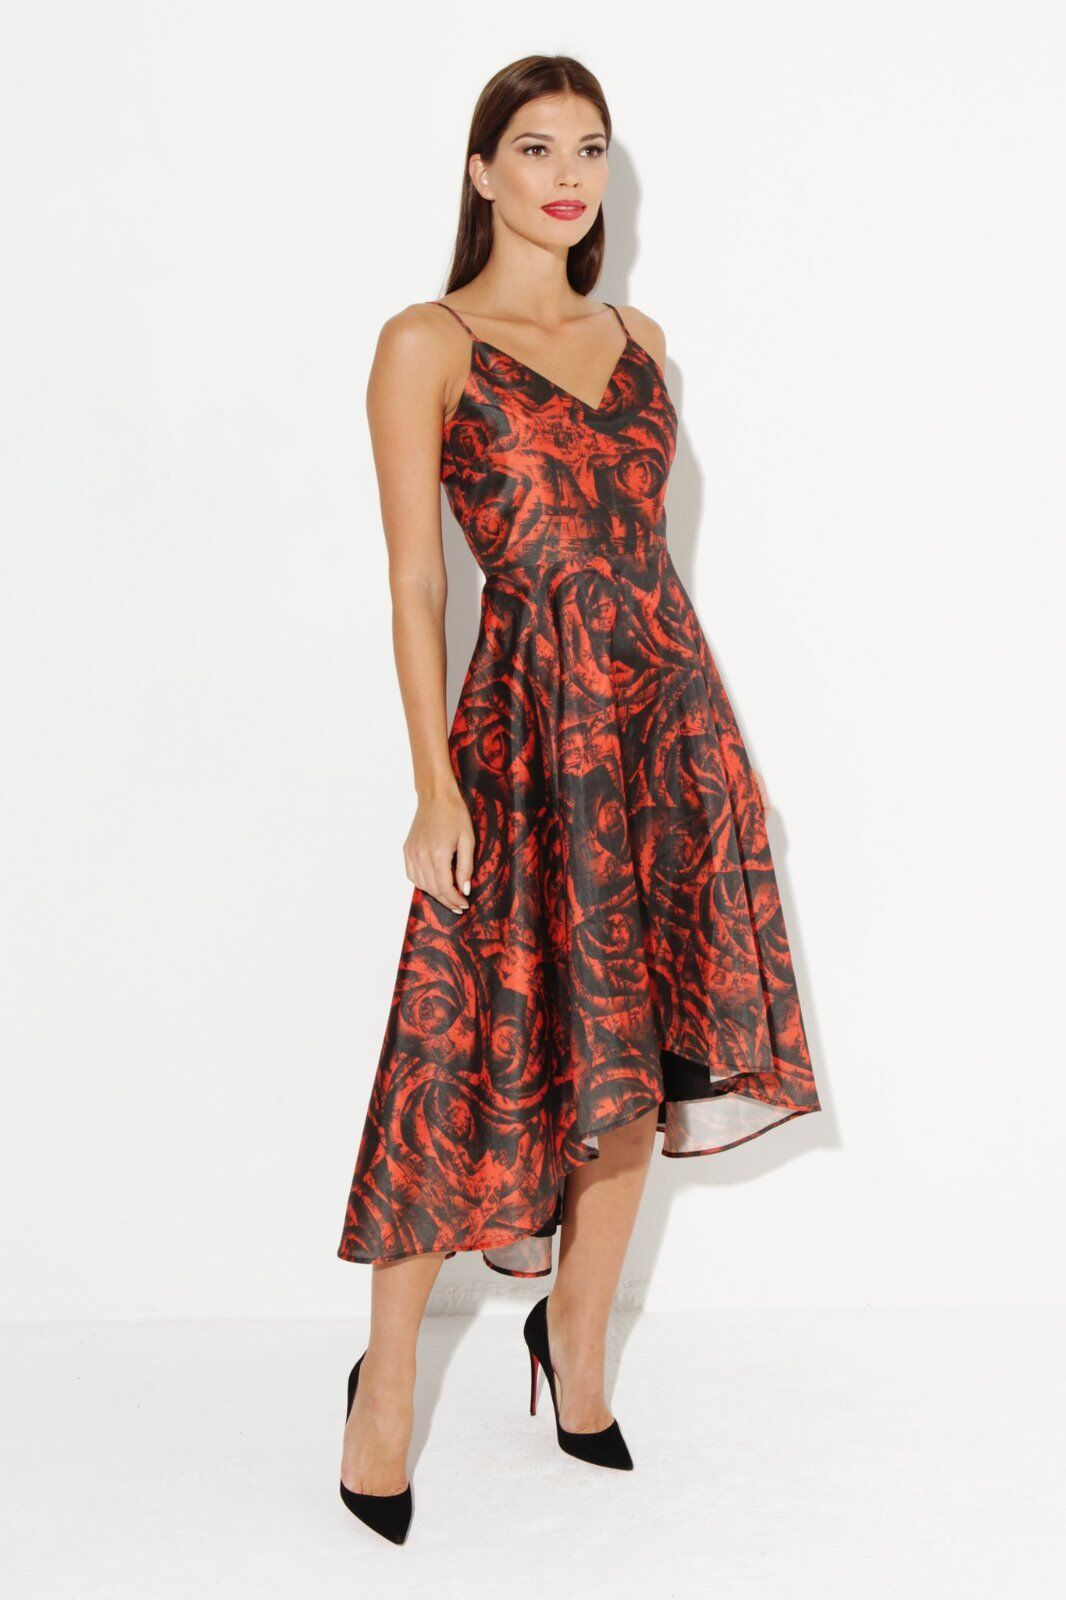 Pearls & Portraits Keela Dress red & black UK 8 RRP still £139